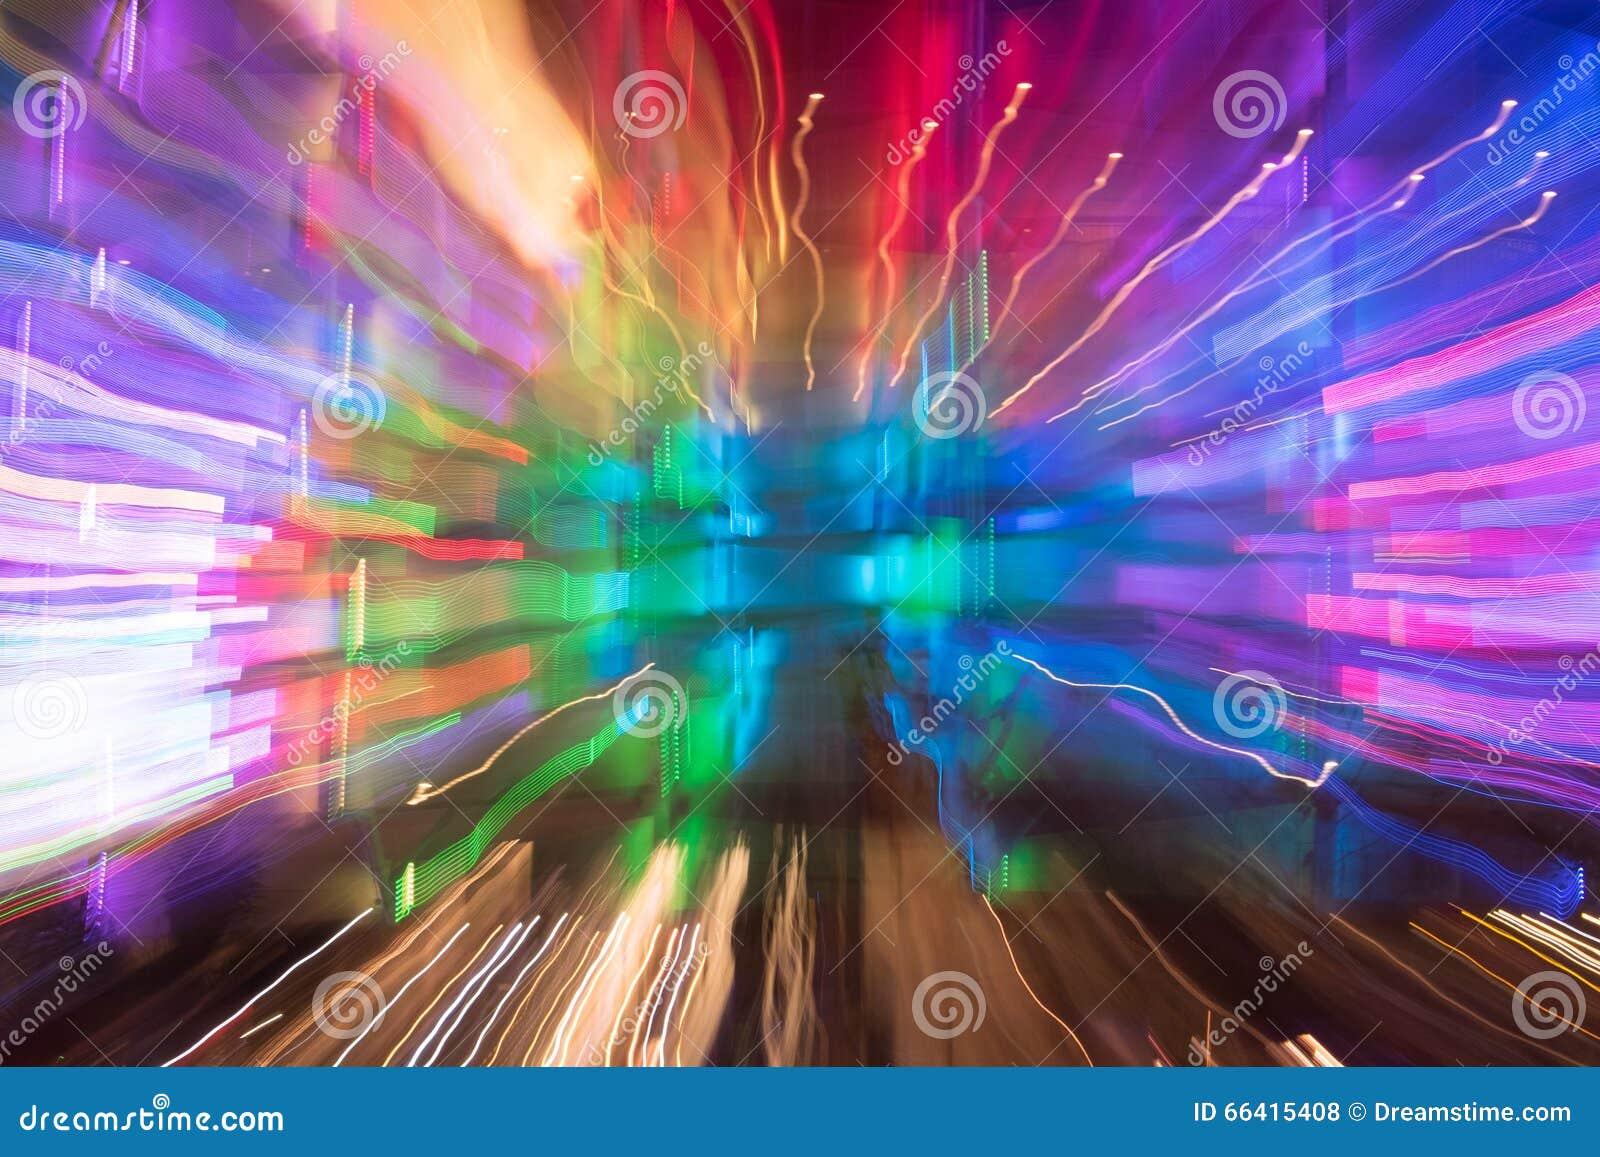 Kolor abstrakcyjne